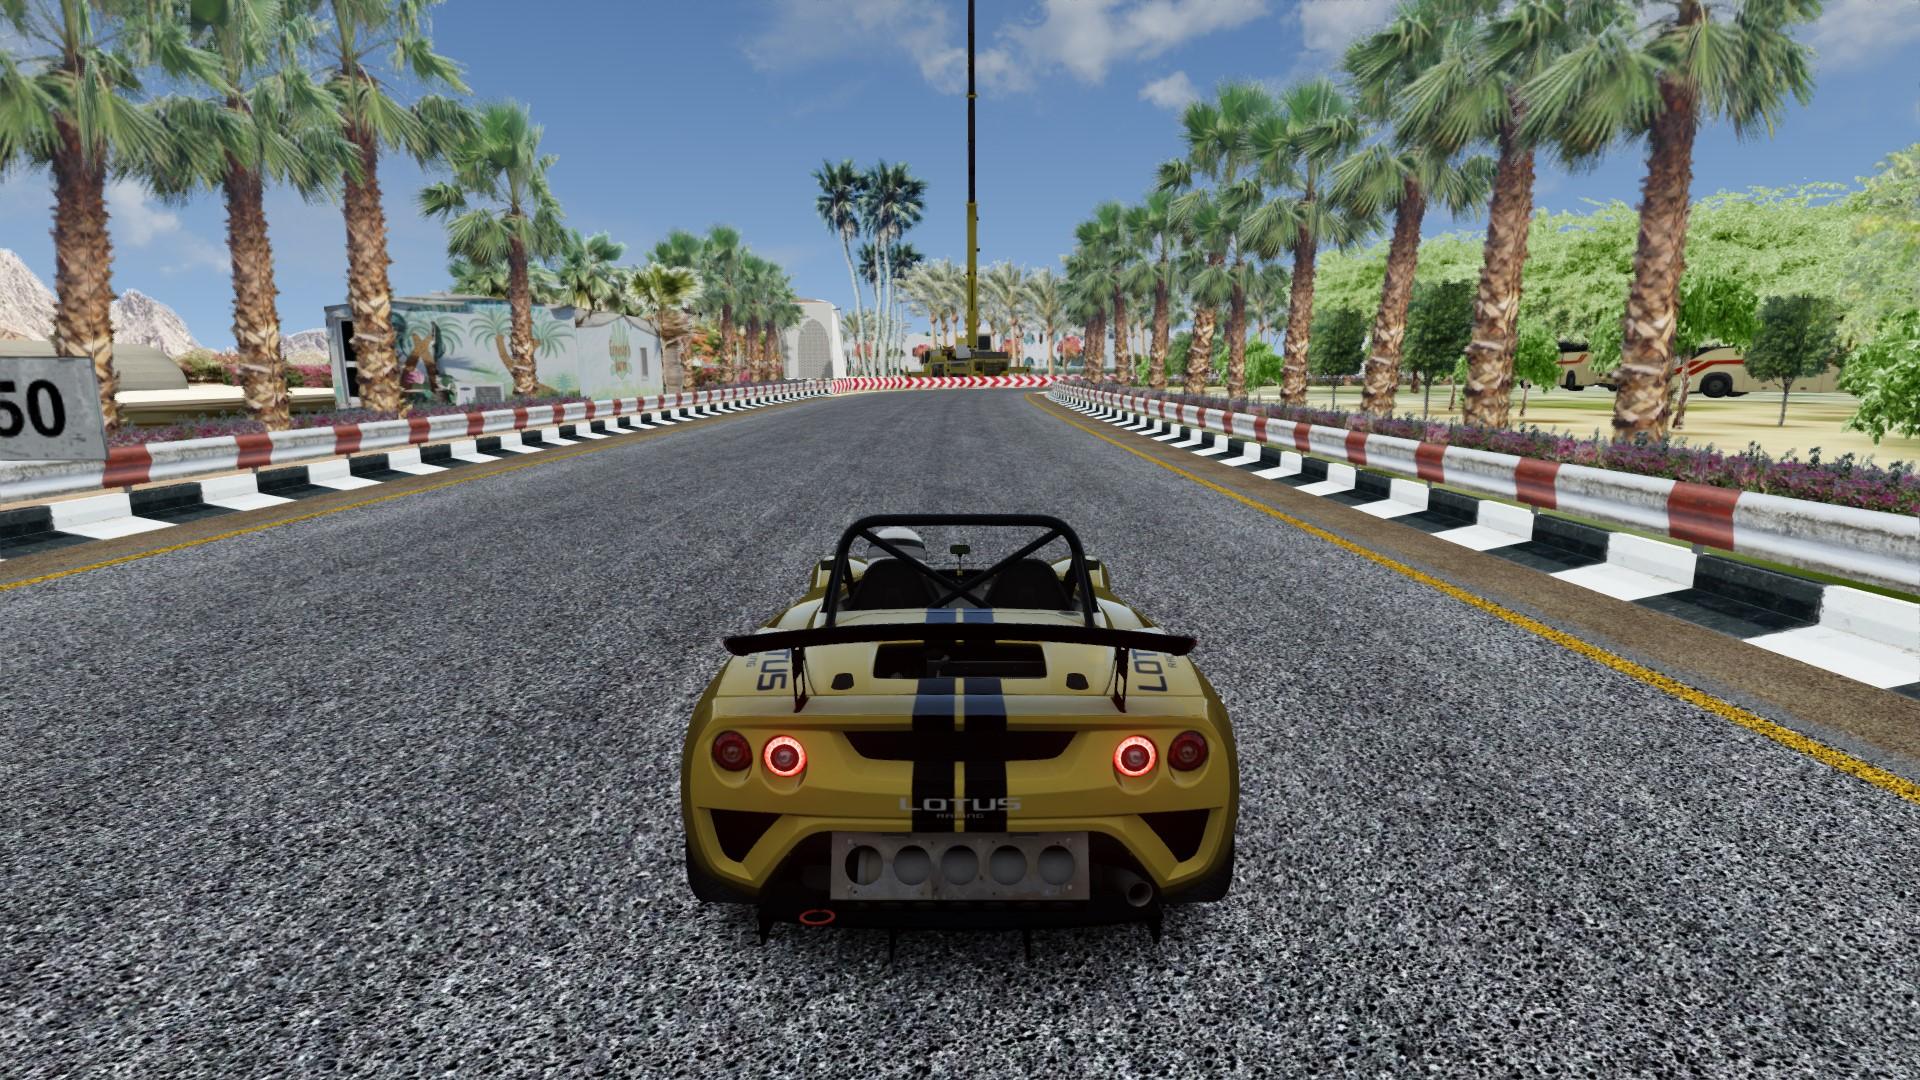 Screenshot_lotus_2_eleven_dominacoralbay_5-4-117-15-25-52.jpg